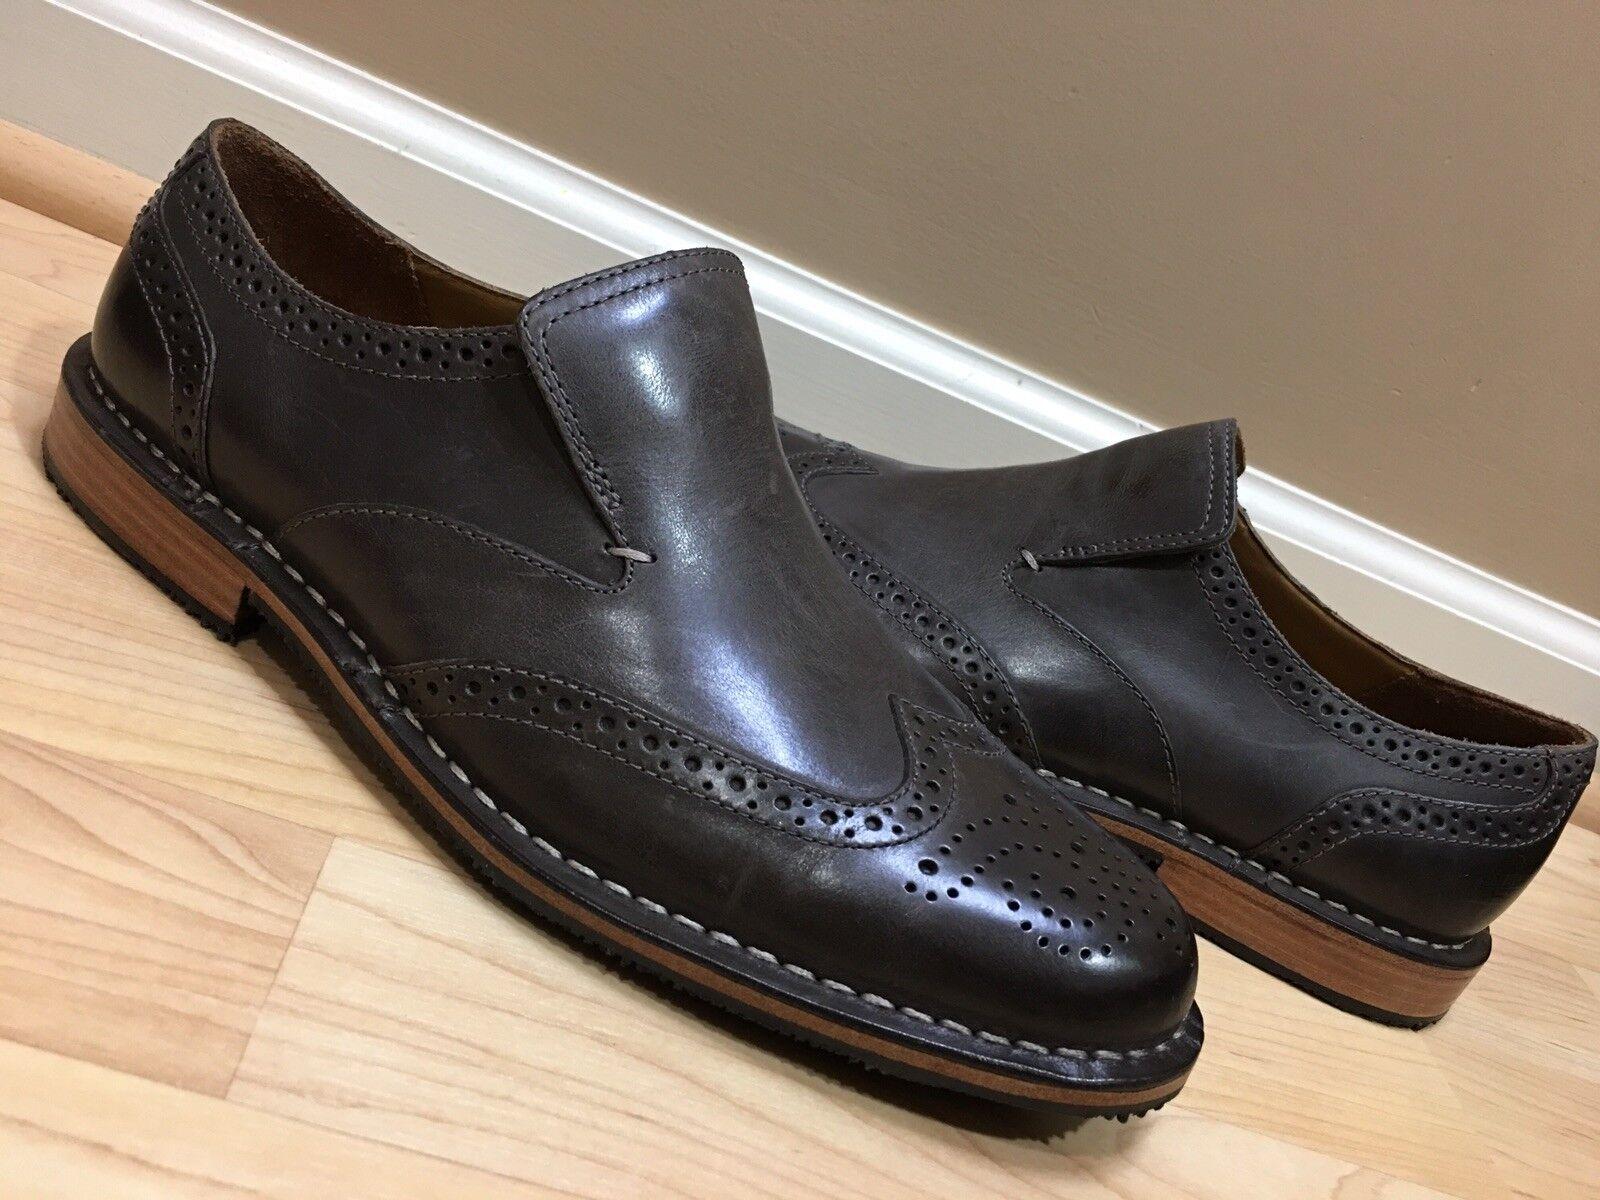 NEW MENS SEBAGO grigio BRATTLE LEATHER SLIP ON OXFORD scarpe US 8.5 M 100%AUTHENTIC